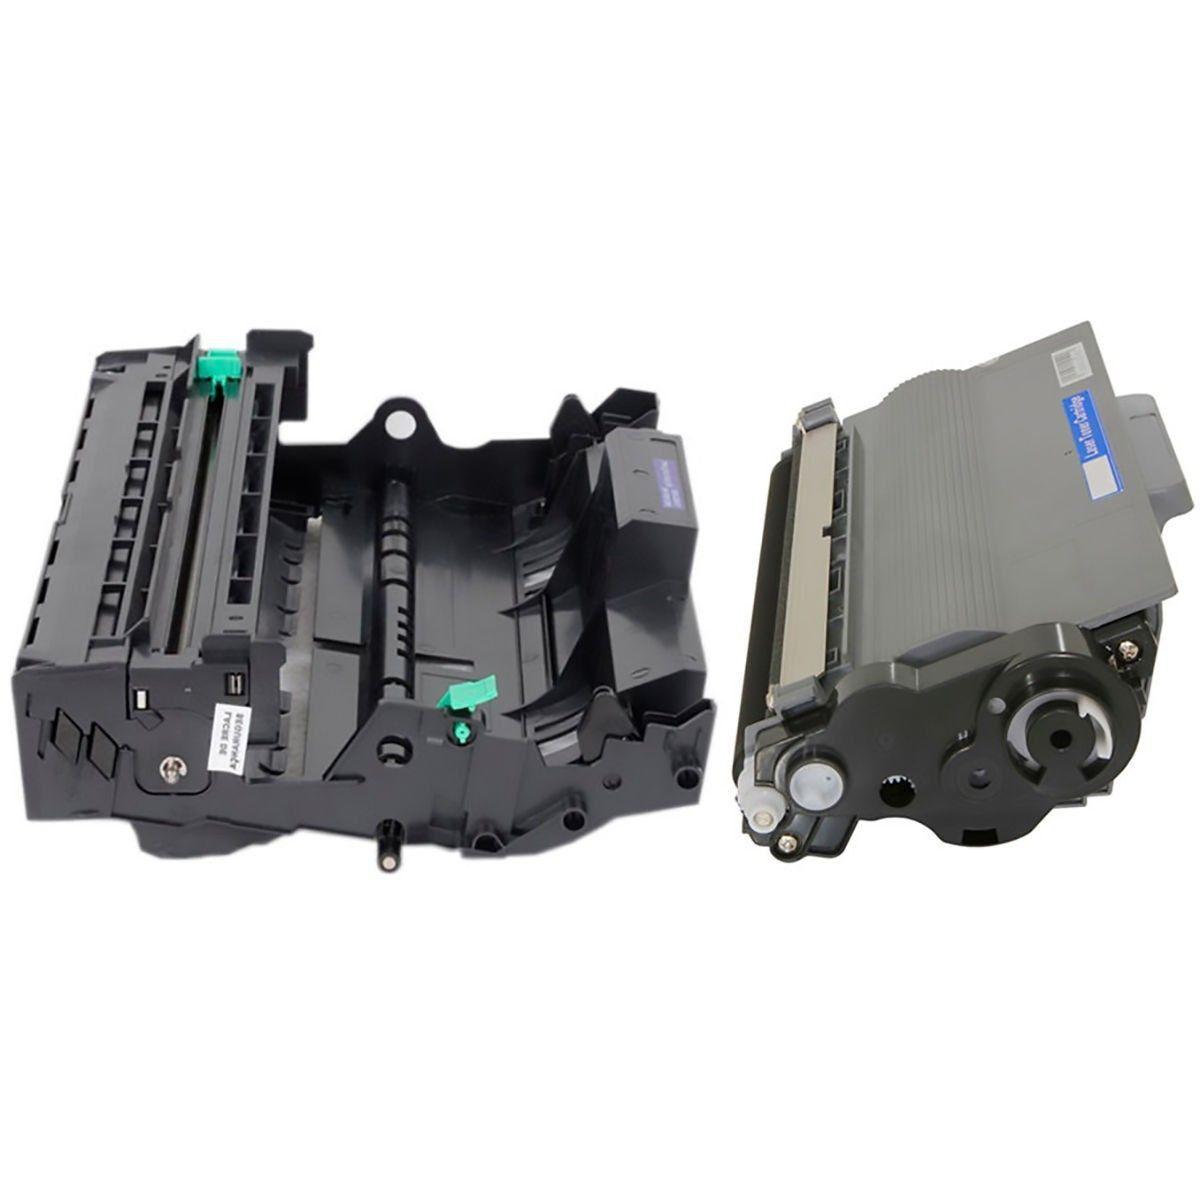 Compatível: Combo Fotocondutor DR720 DR3302 + Toner TN750 TN720 TN3382 para Brother DCP-8152 8152dn MFC8510 8155dn 6182